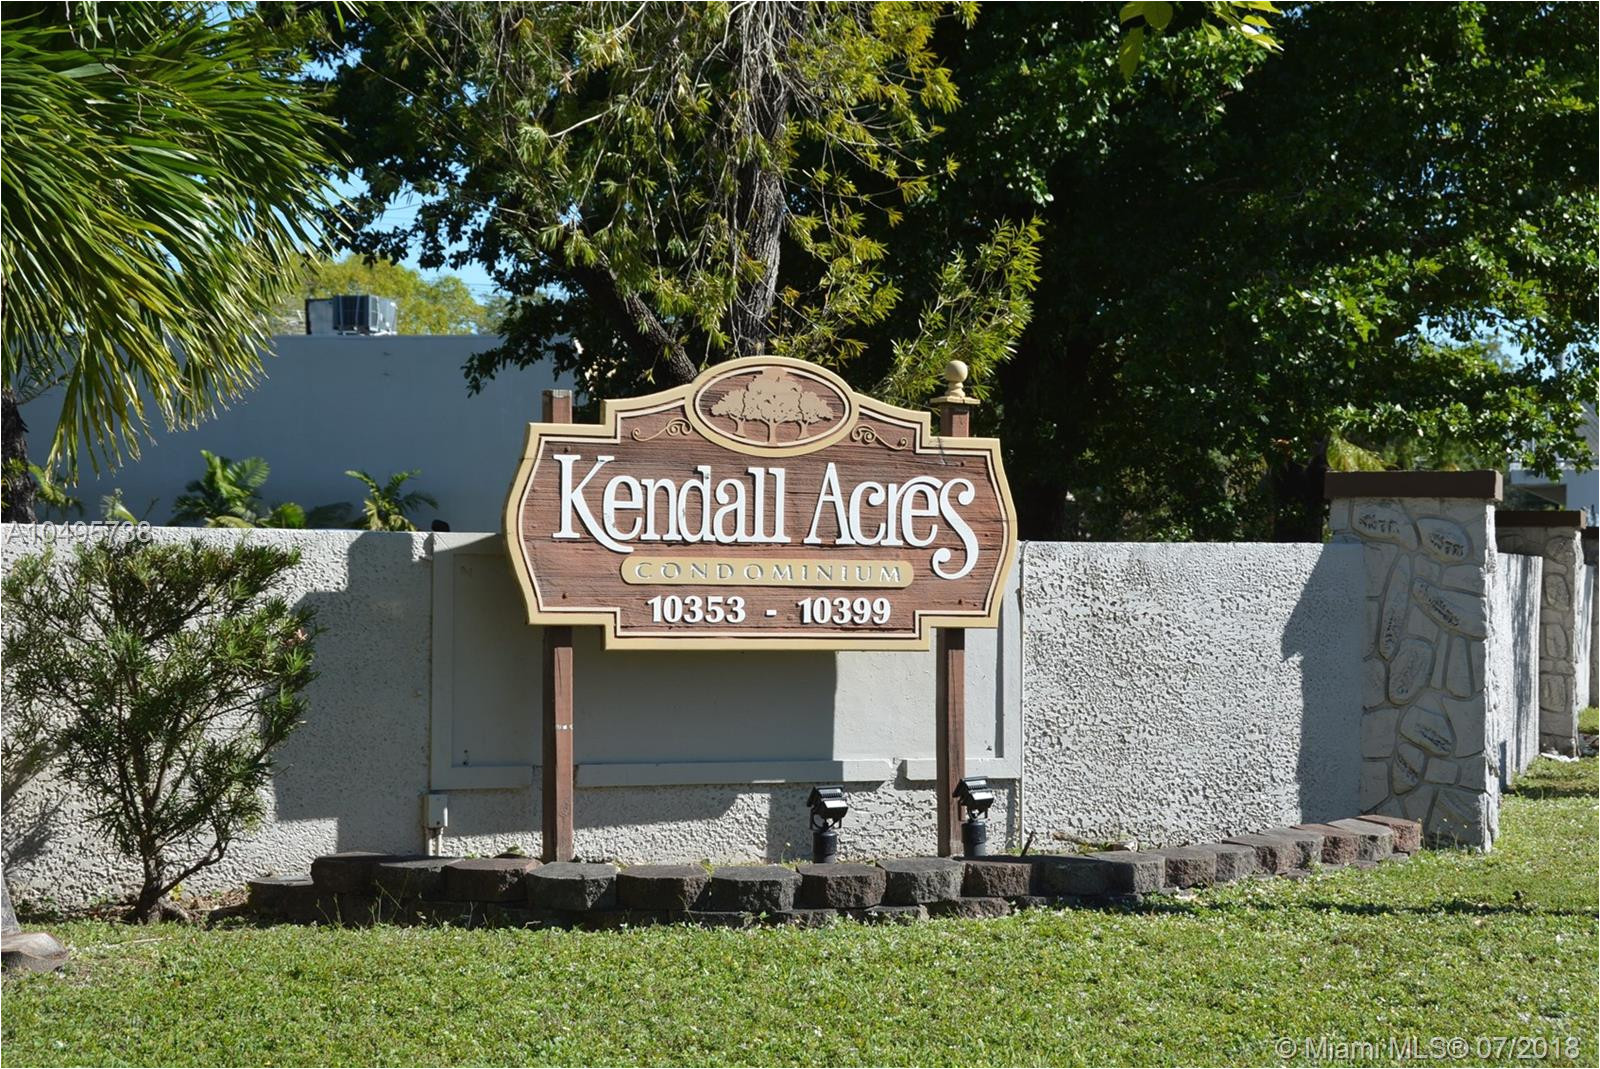 kendall bienes raa ces y viviendas en venta en kendall fl realestate com